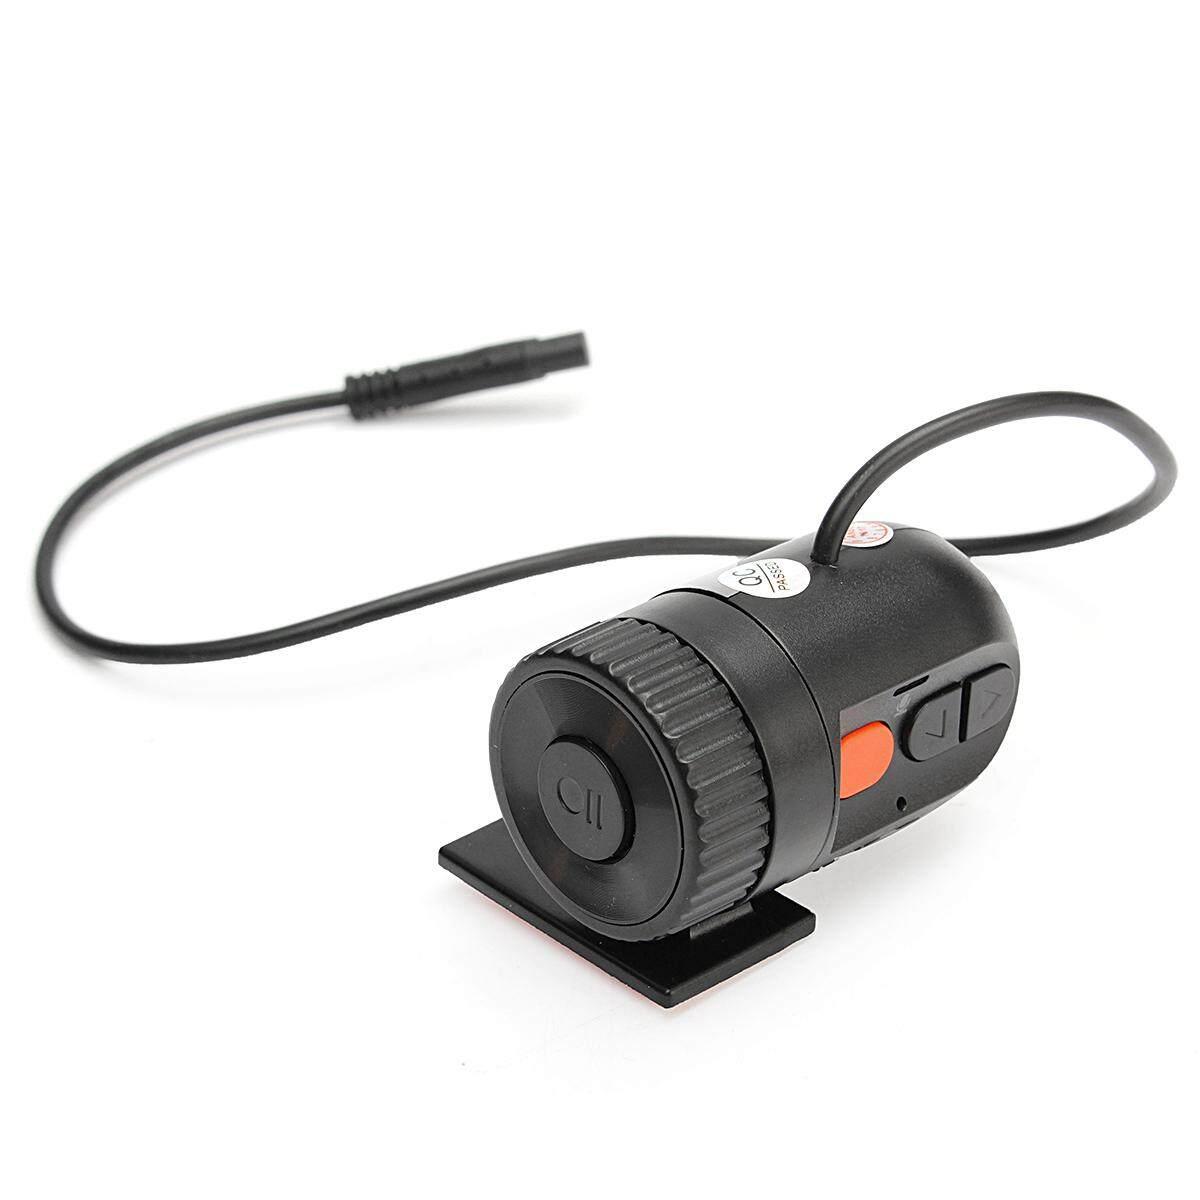 Hd Mini Car Dvr Video Recorder Hidden Dash Cam Vehicle Spy Camera Night Vision - Intl By Freebang.